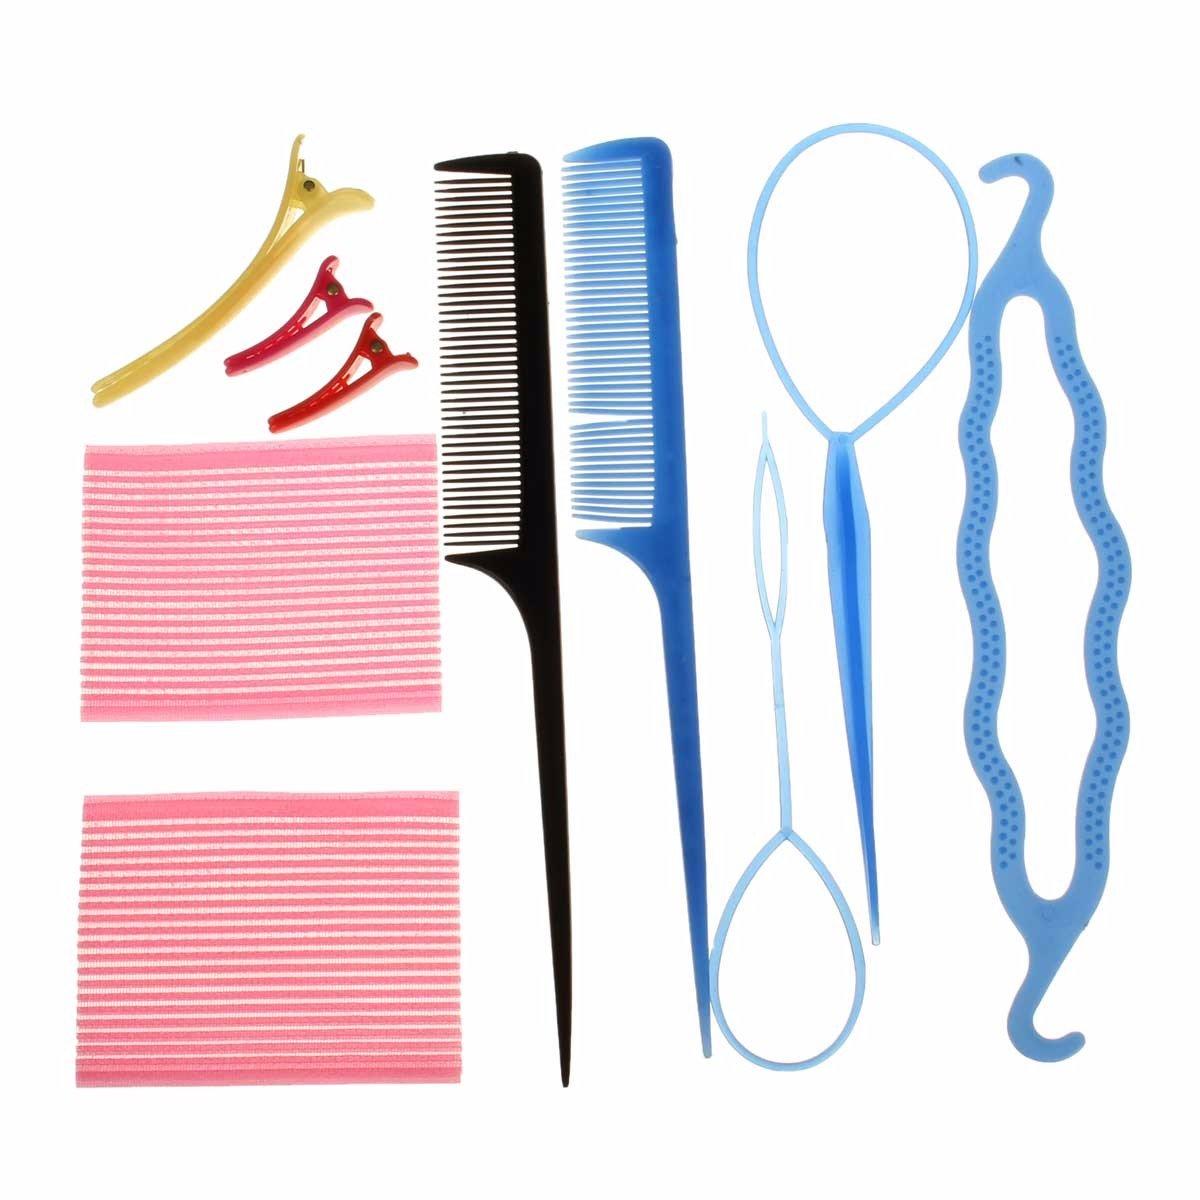 Lady Hair Twist Styling Clip Stick Bun Maker Braid Accessories Tool